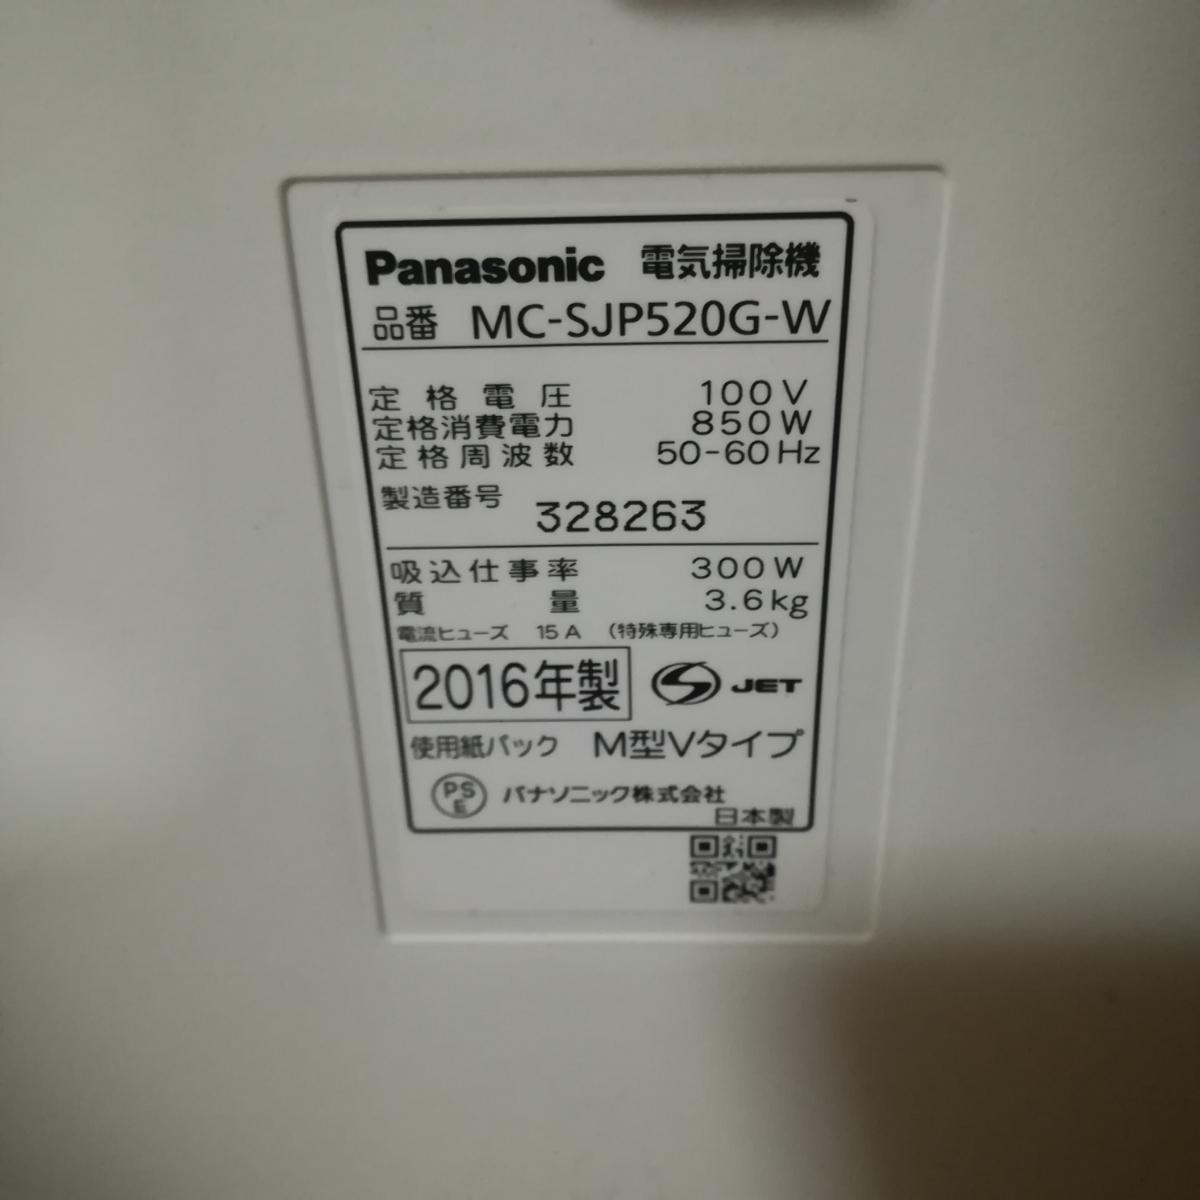 MC-SJP520G パナソニック 掃除機 新品紙パック付 送料無料 美品_画像9